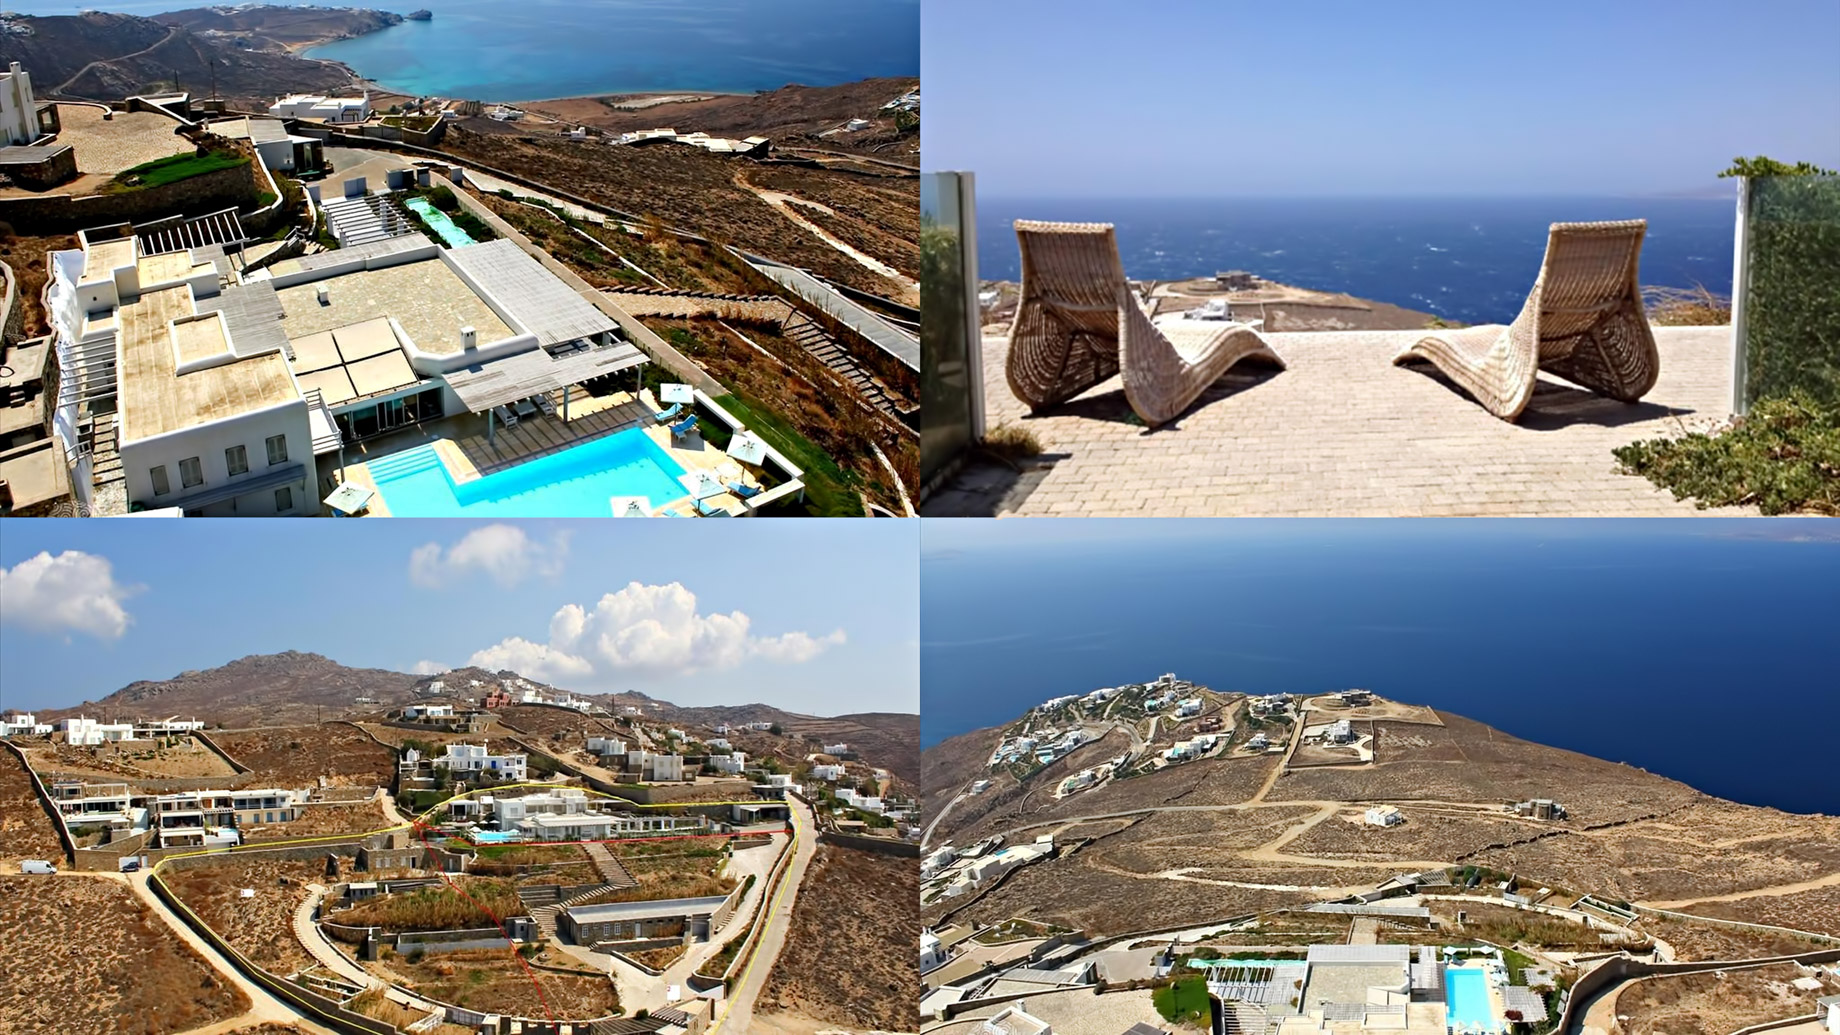 Mykonos Greece Real Estate - The Aegean Island Property Market